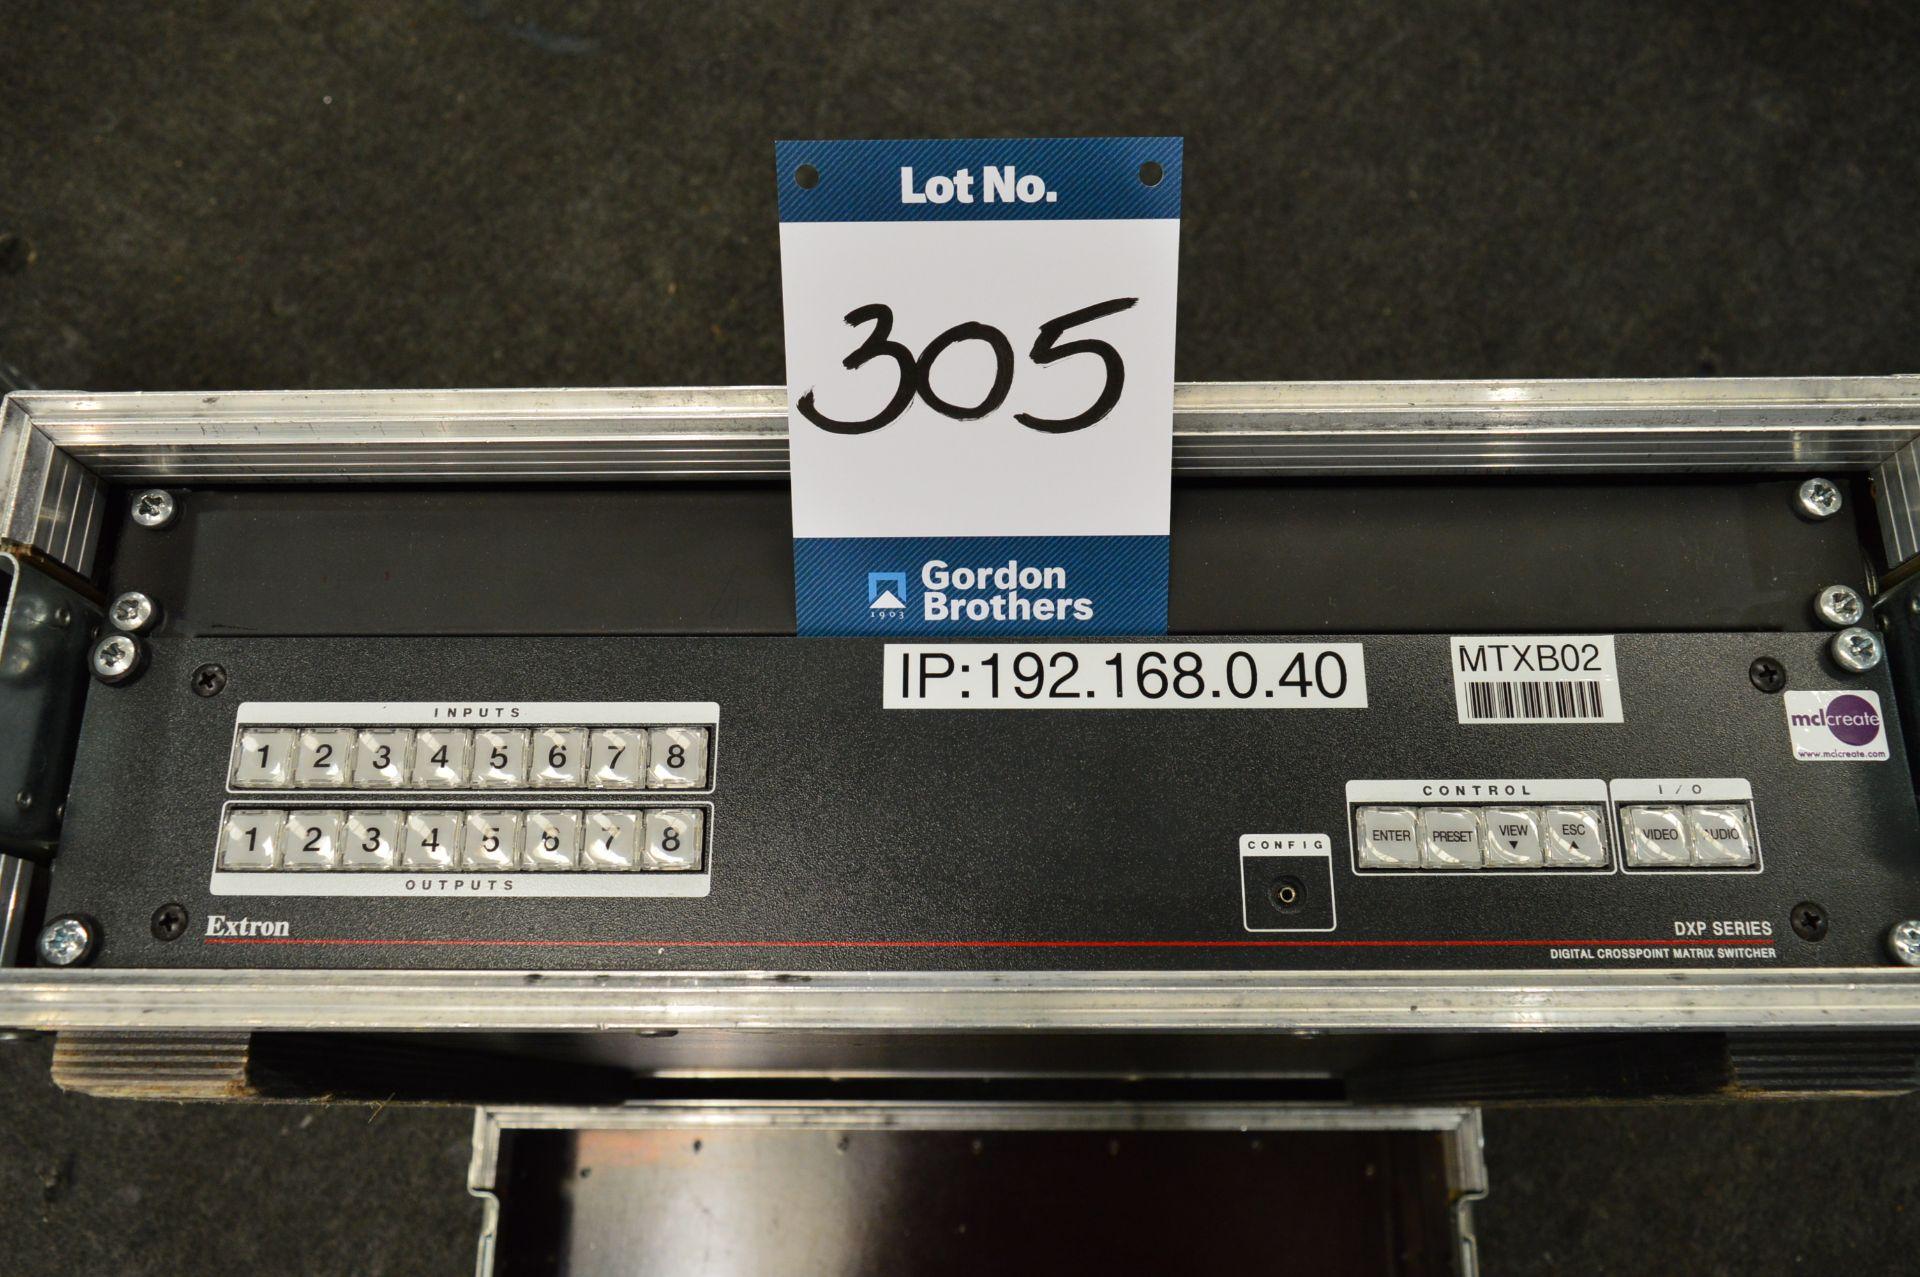 Lot 305 - Extron, DXP Series 8/8 digital cross point matrix